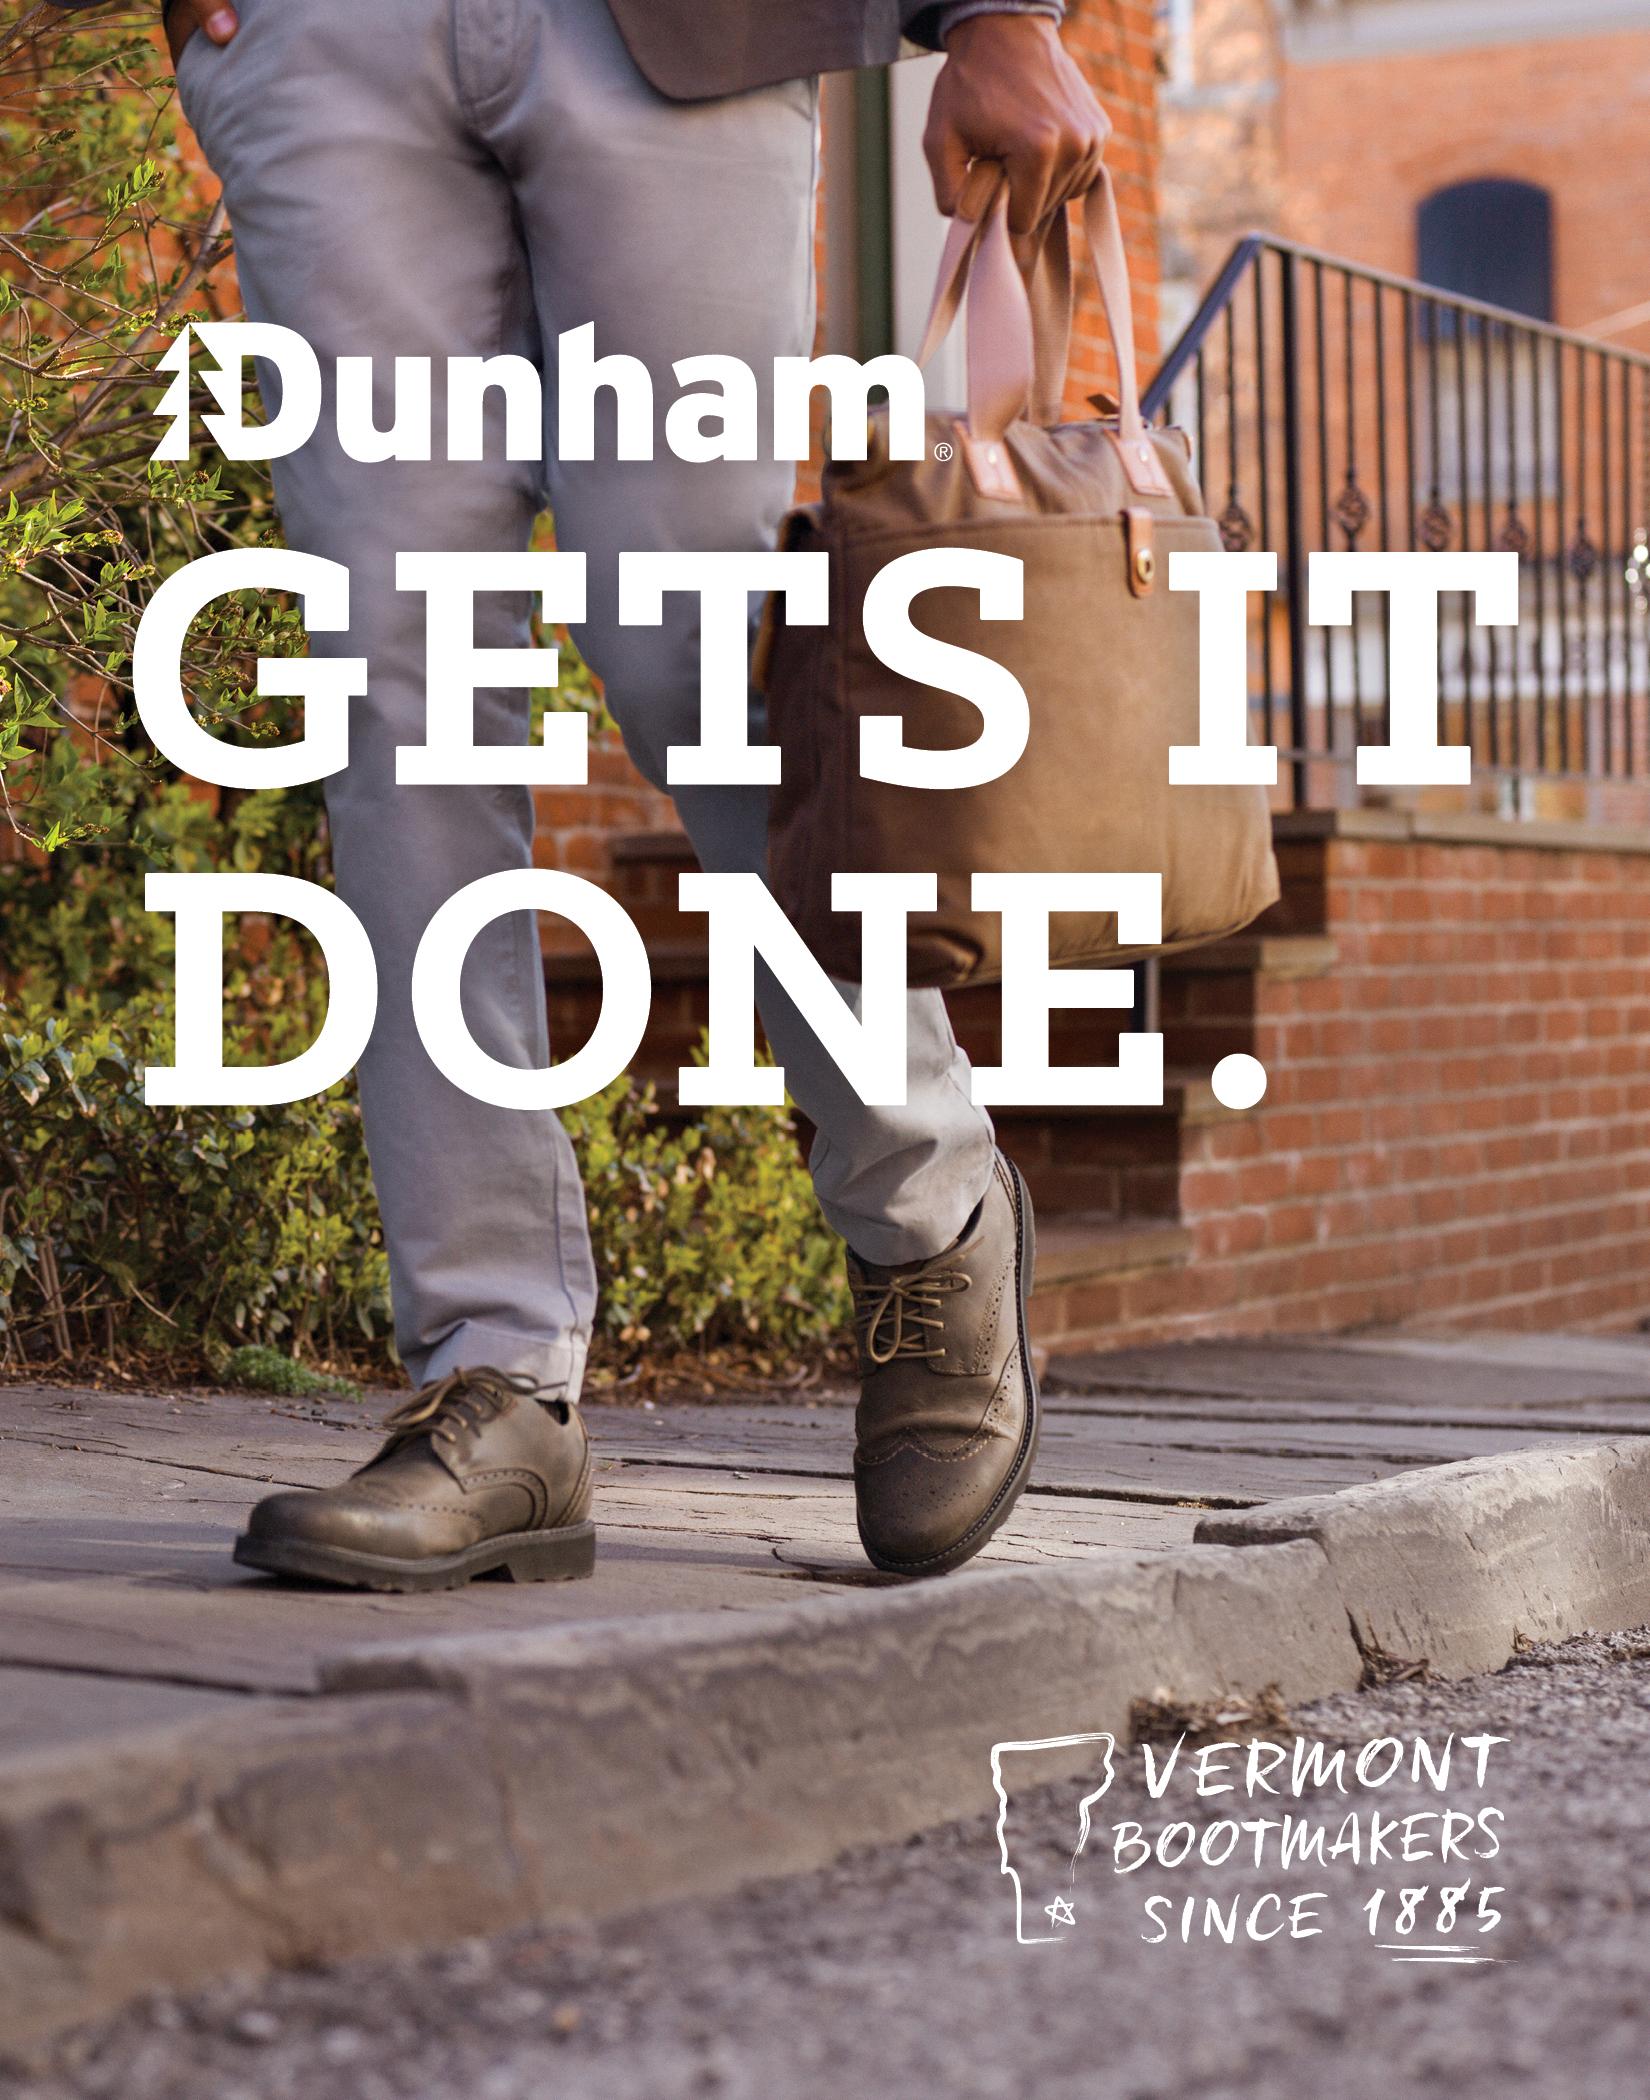 Dunham_SIS_051616_ForPrint3.jpg